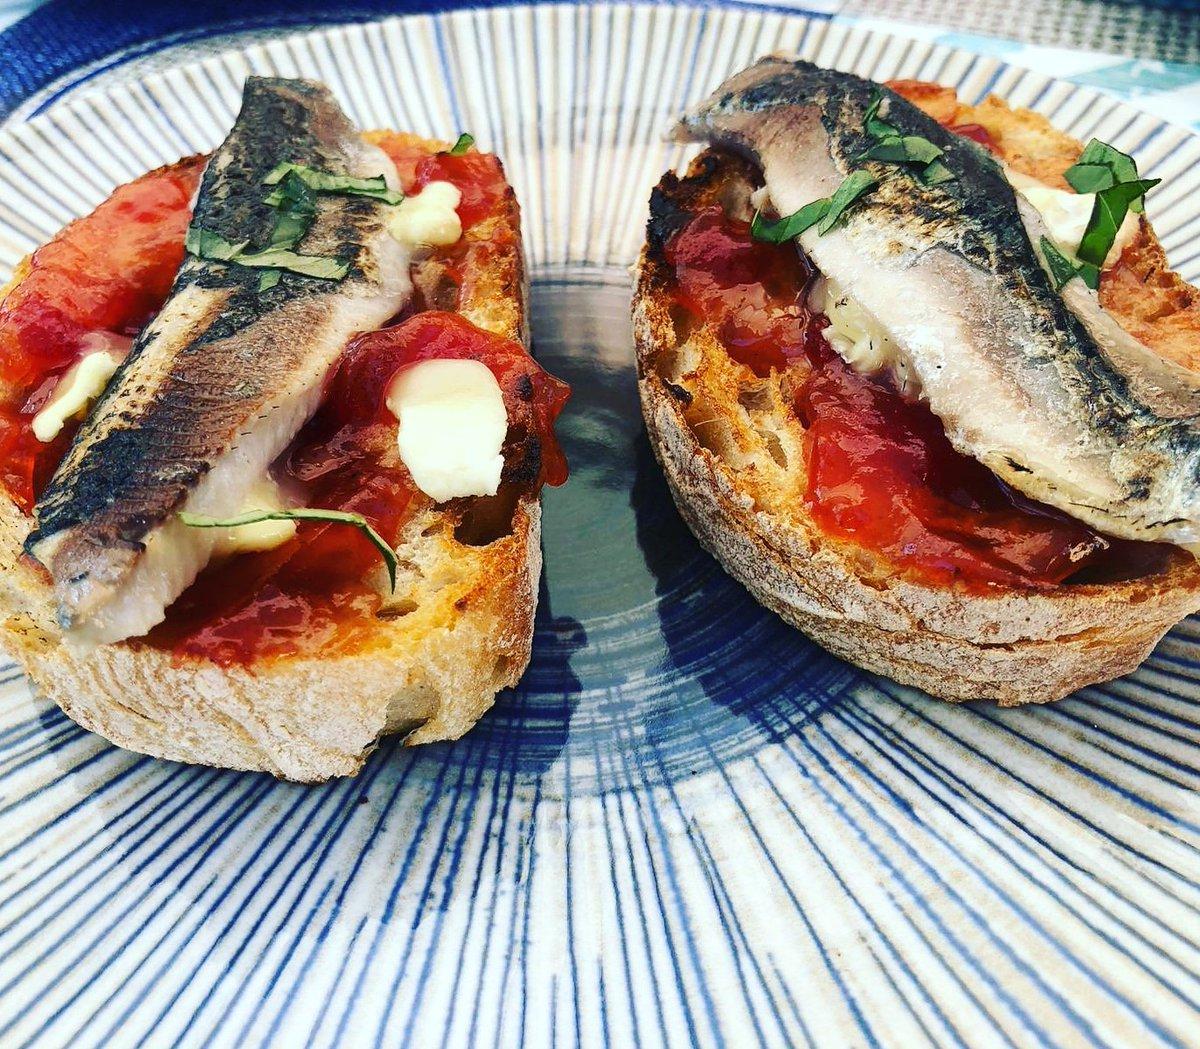 #miercolesdevino con @tisonfe  @nanapikonico y tosta de sardina a la llama, mermelada de tomate, queso do #cebreiro y albahaca. 😋😋😋😋 Receta magistral de @elcocinerocasero  #vigo #feitonacasa #comoencasaenningunsitio #comomevoyaponer #encasacocinoyo #recetas #cousine #cocina